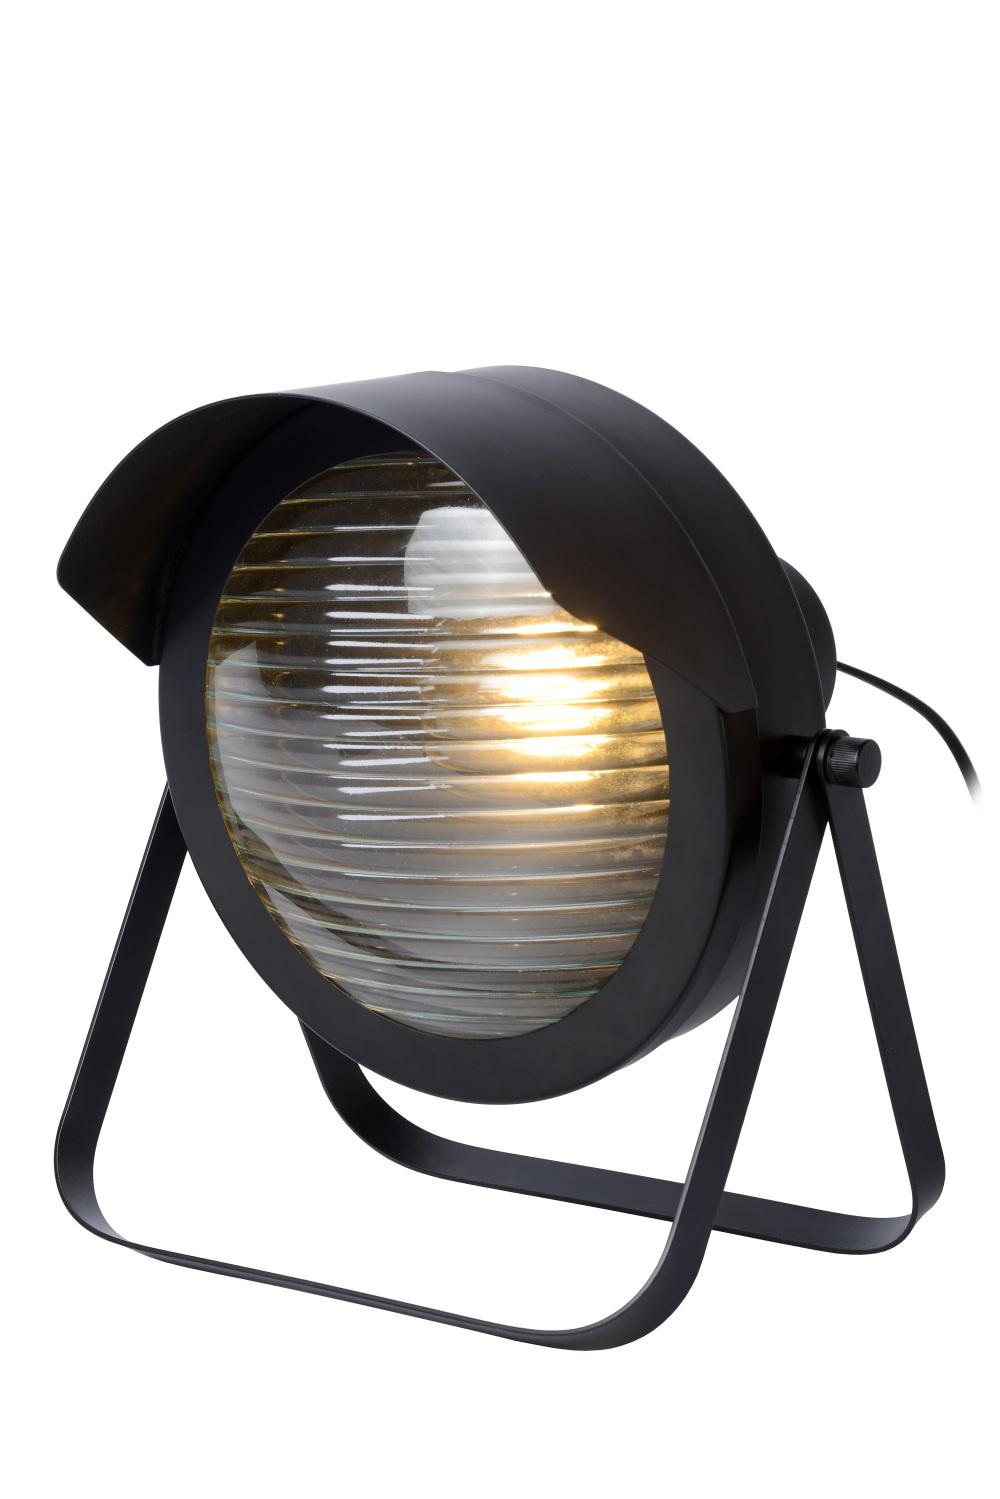 Lucide CICLETA Tafellamp-Zwart-1xE27-40W-Staal